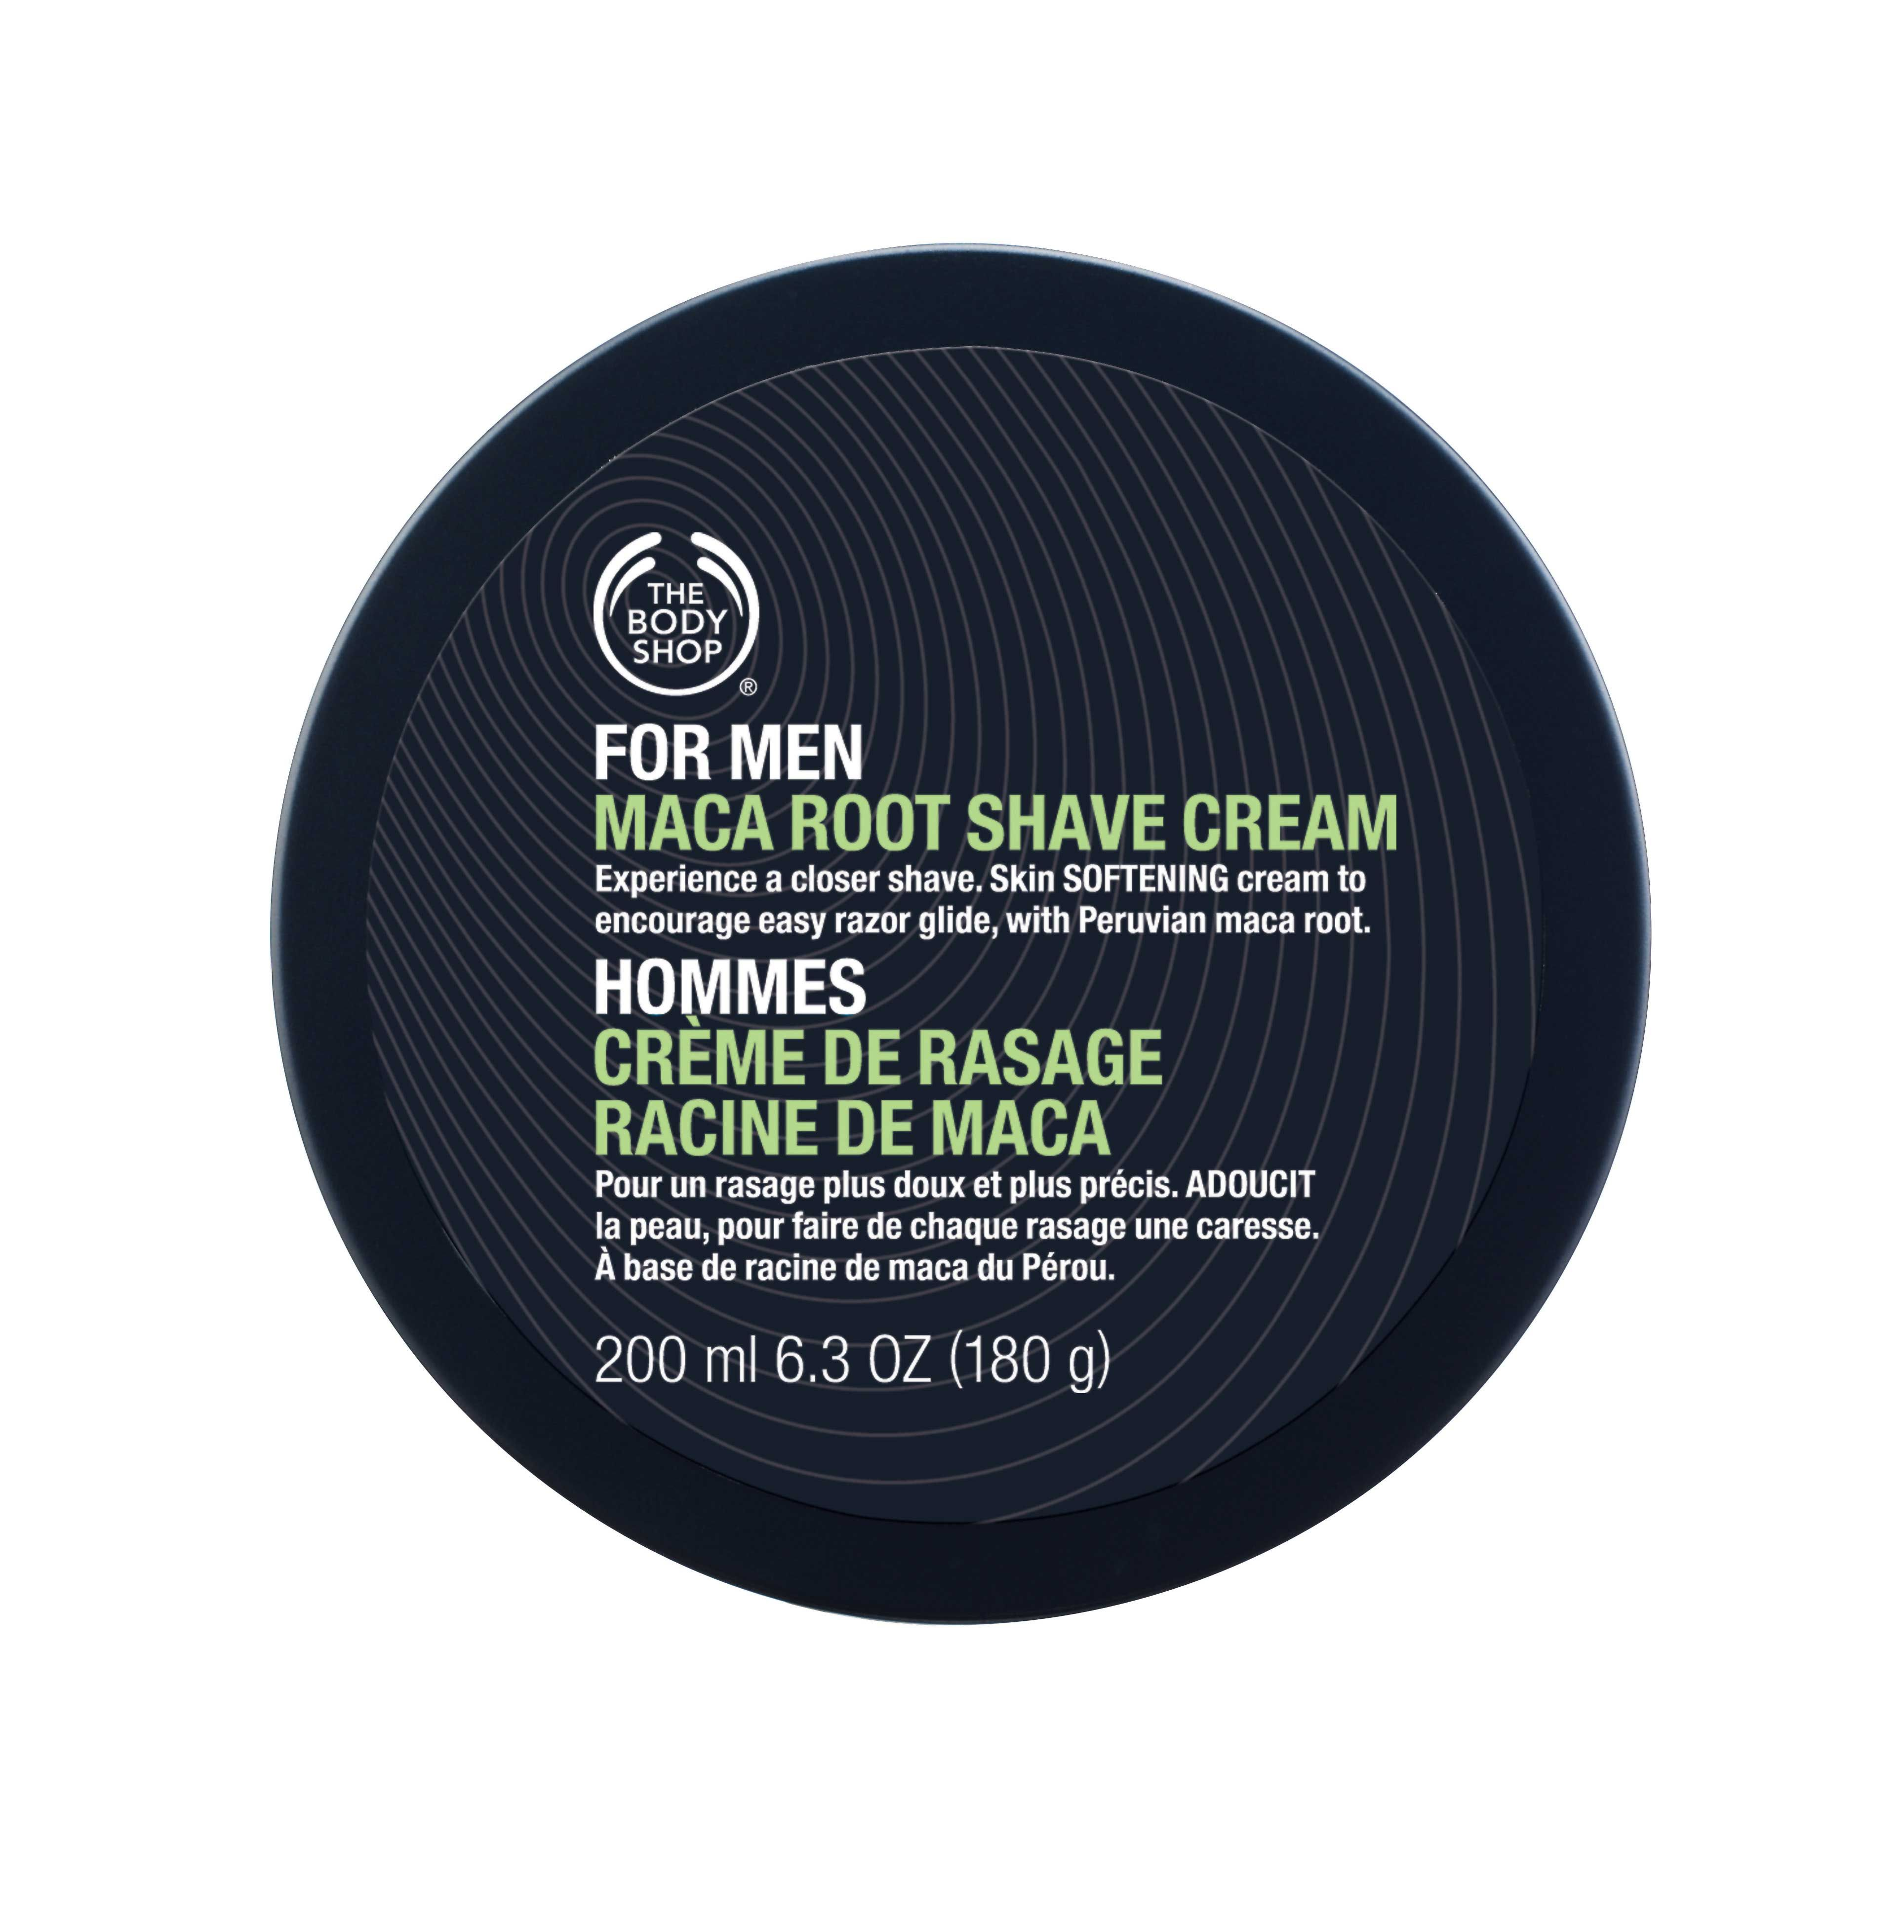 The Body Shop  Maca Shave Cream  $28.00